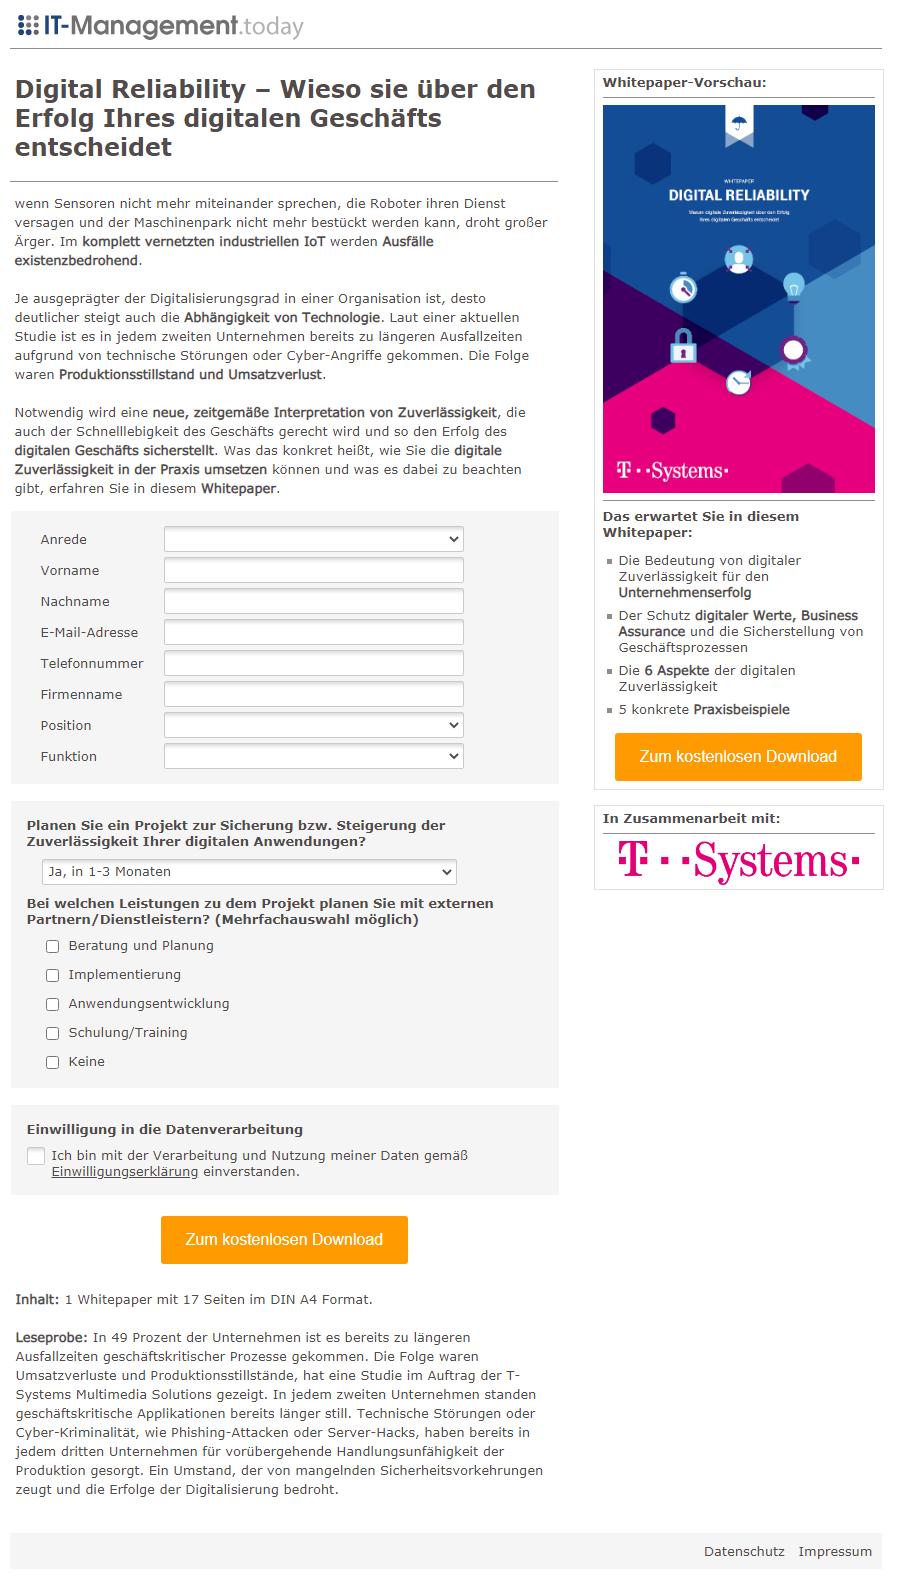 Referenzkampagne_Landingpage_T-Sytems_Digital Reliability